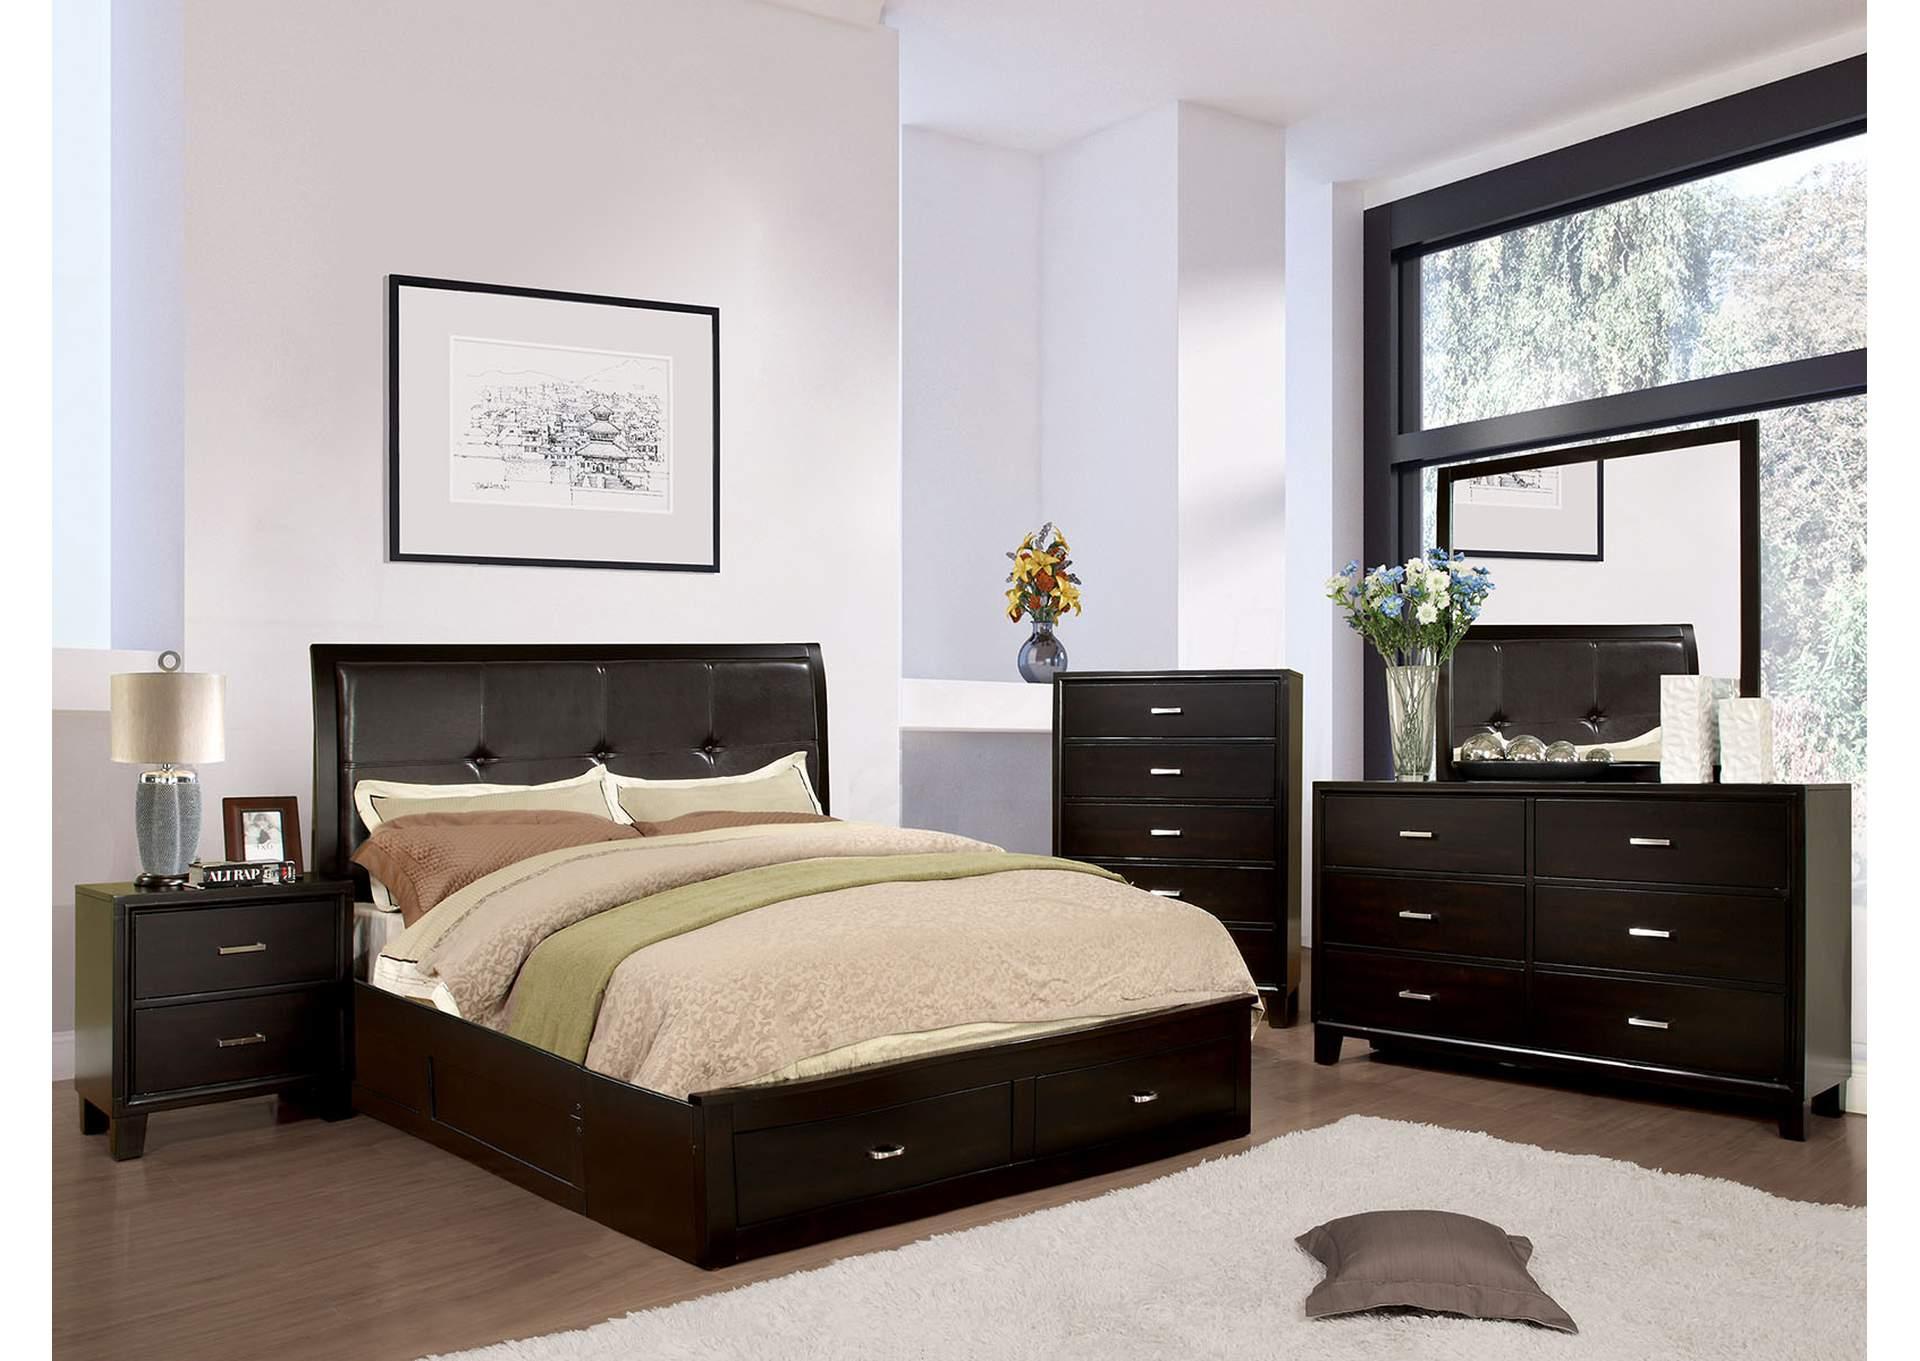 Brothers fine furniture enrico iii espresso eastern king for Furniture of america address